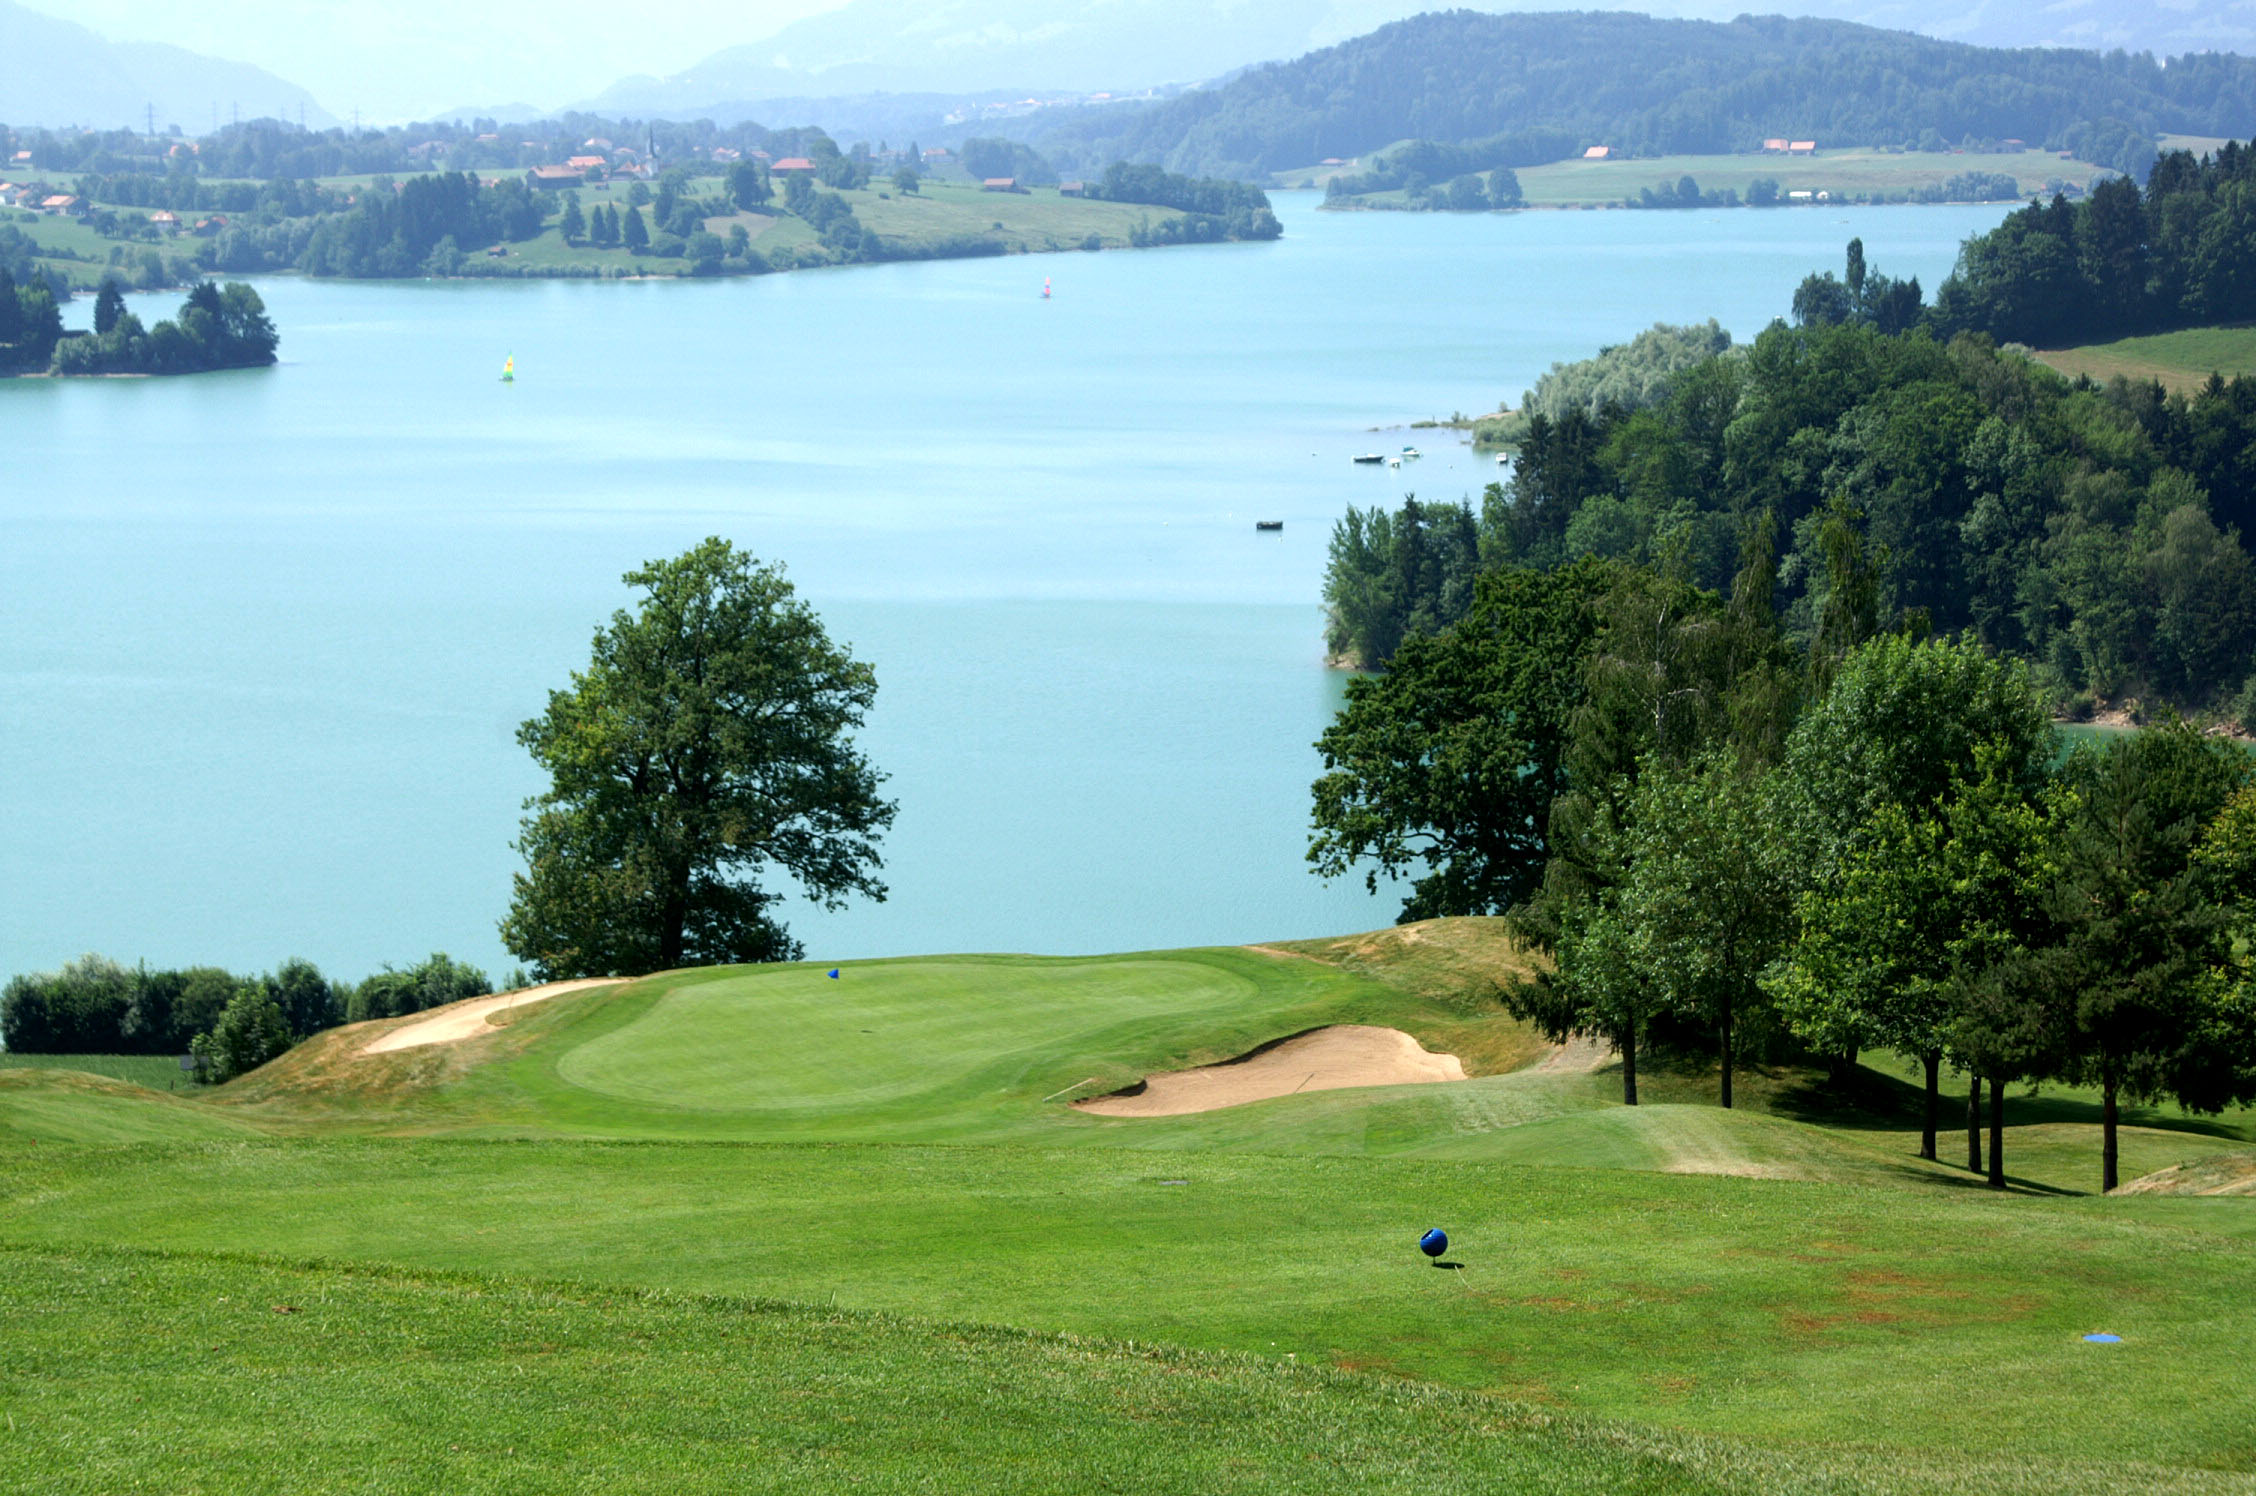 Abschlag vom Tee 1 im Golfclub La Gruyère